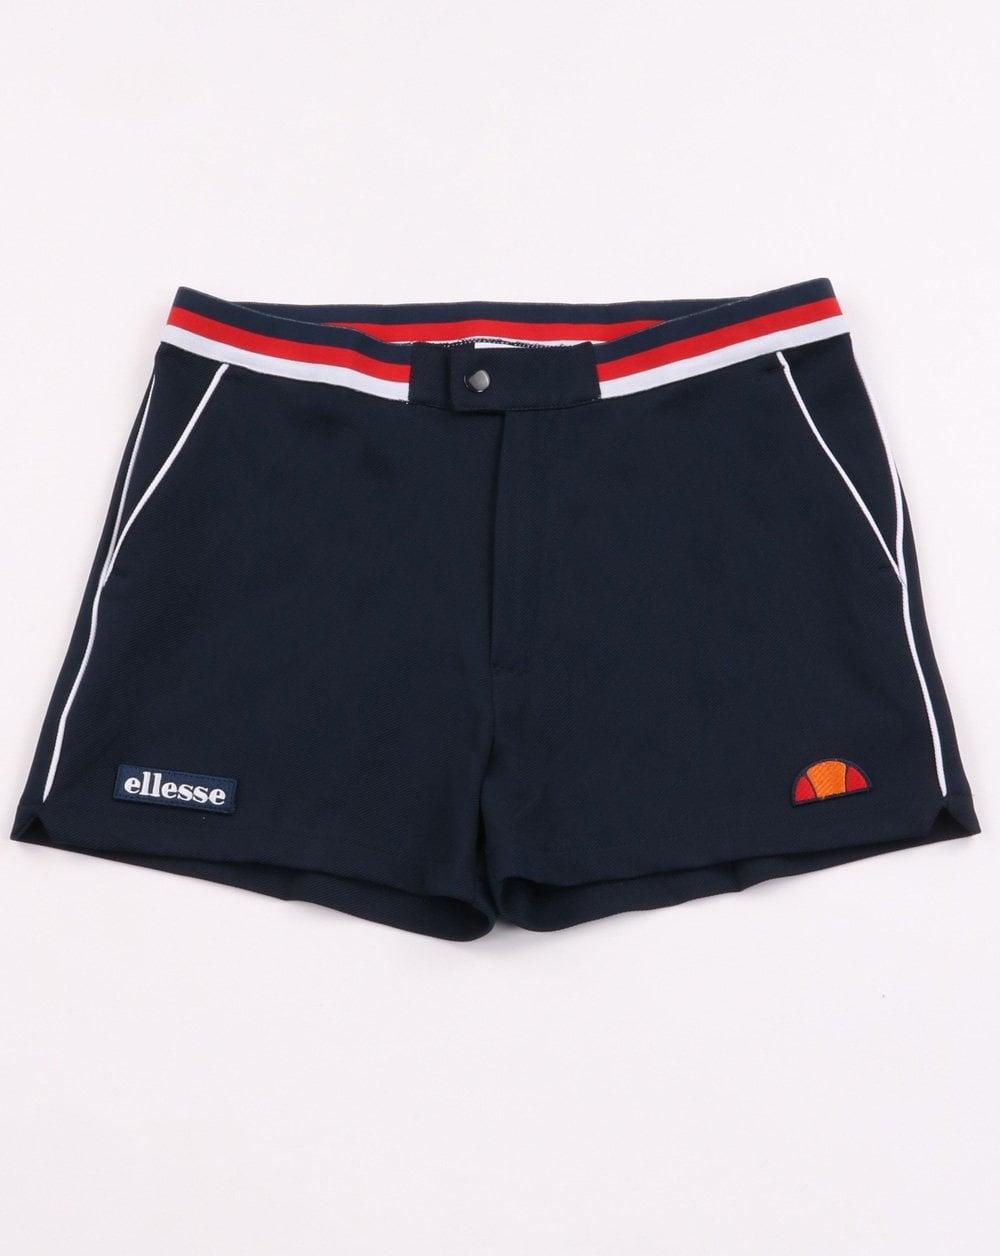 Ellesse 80s tennis shorts